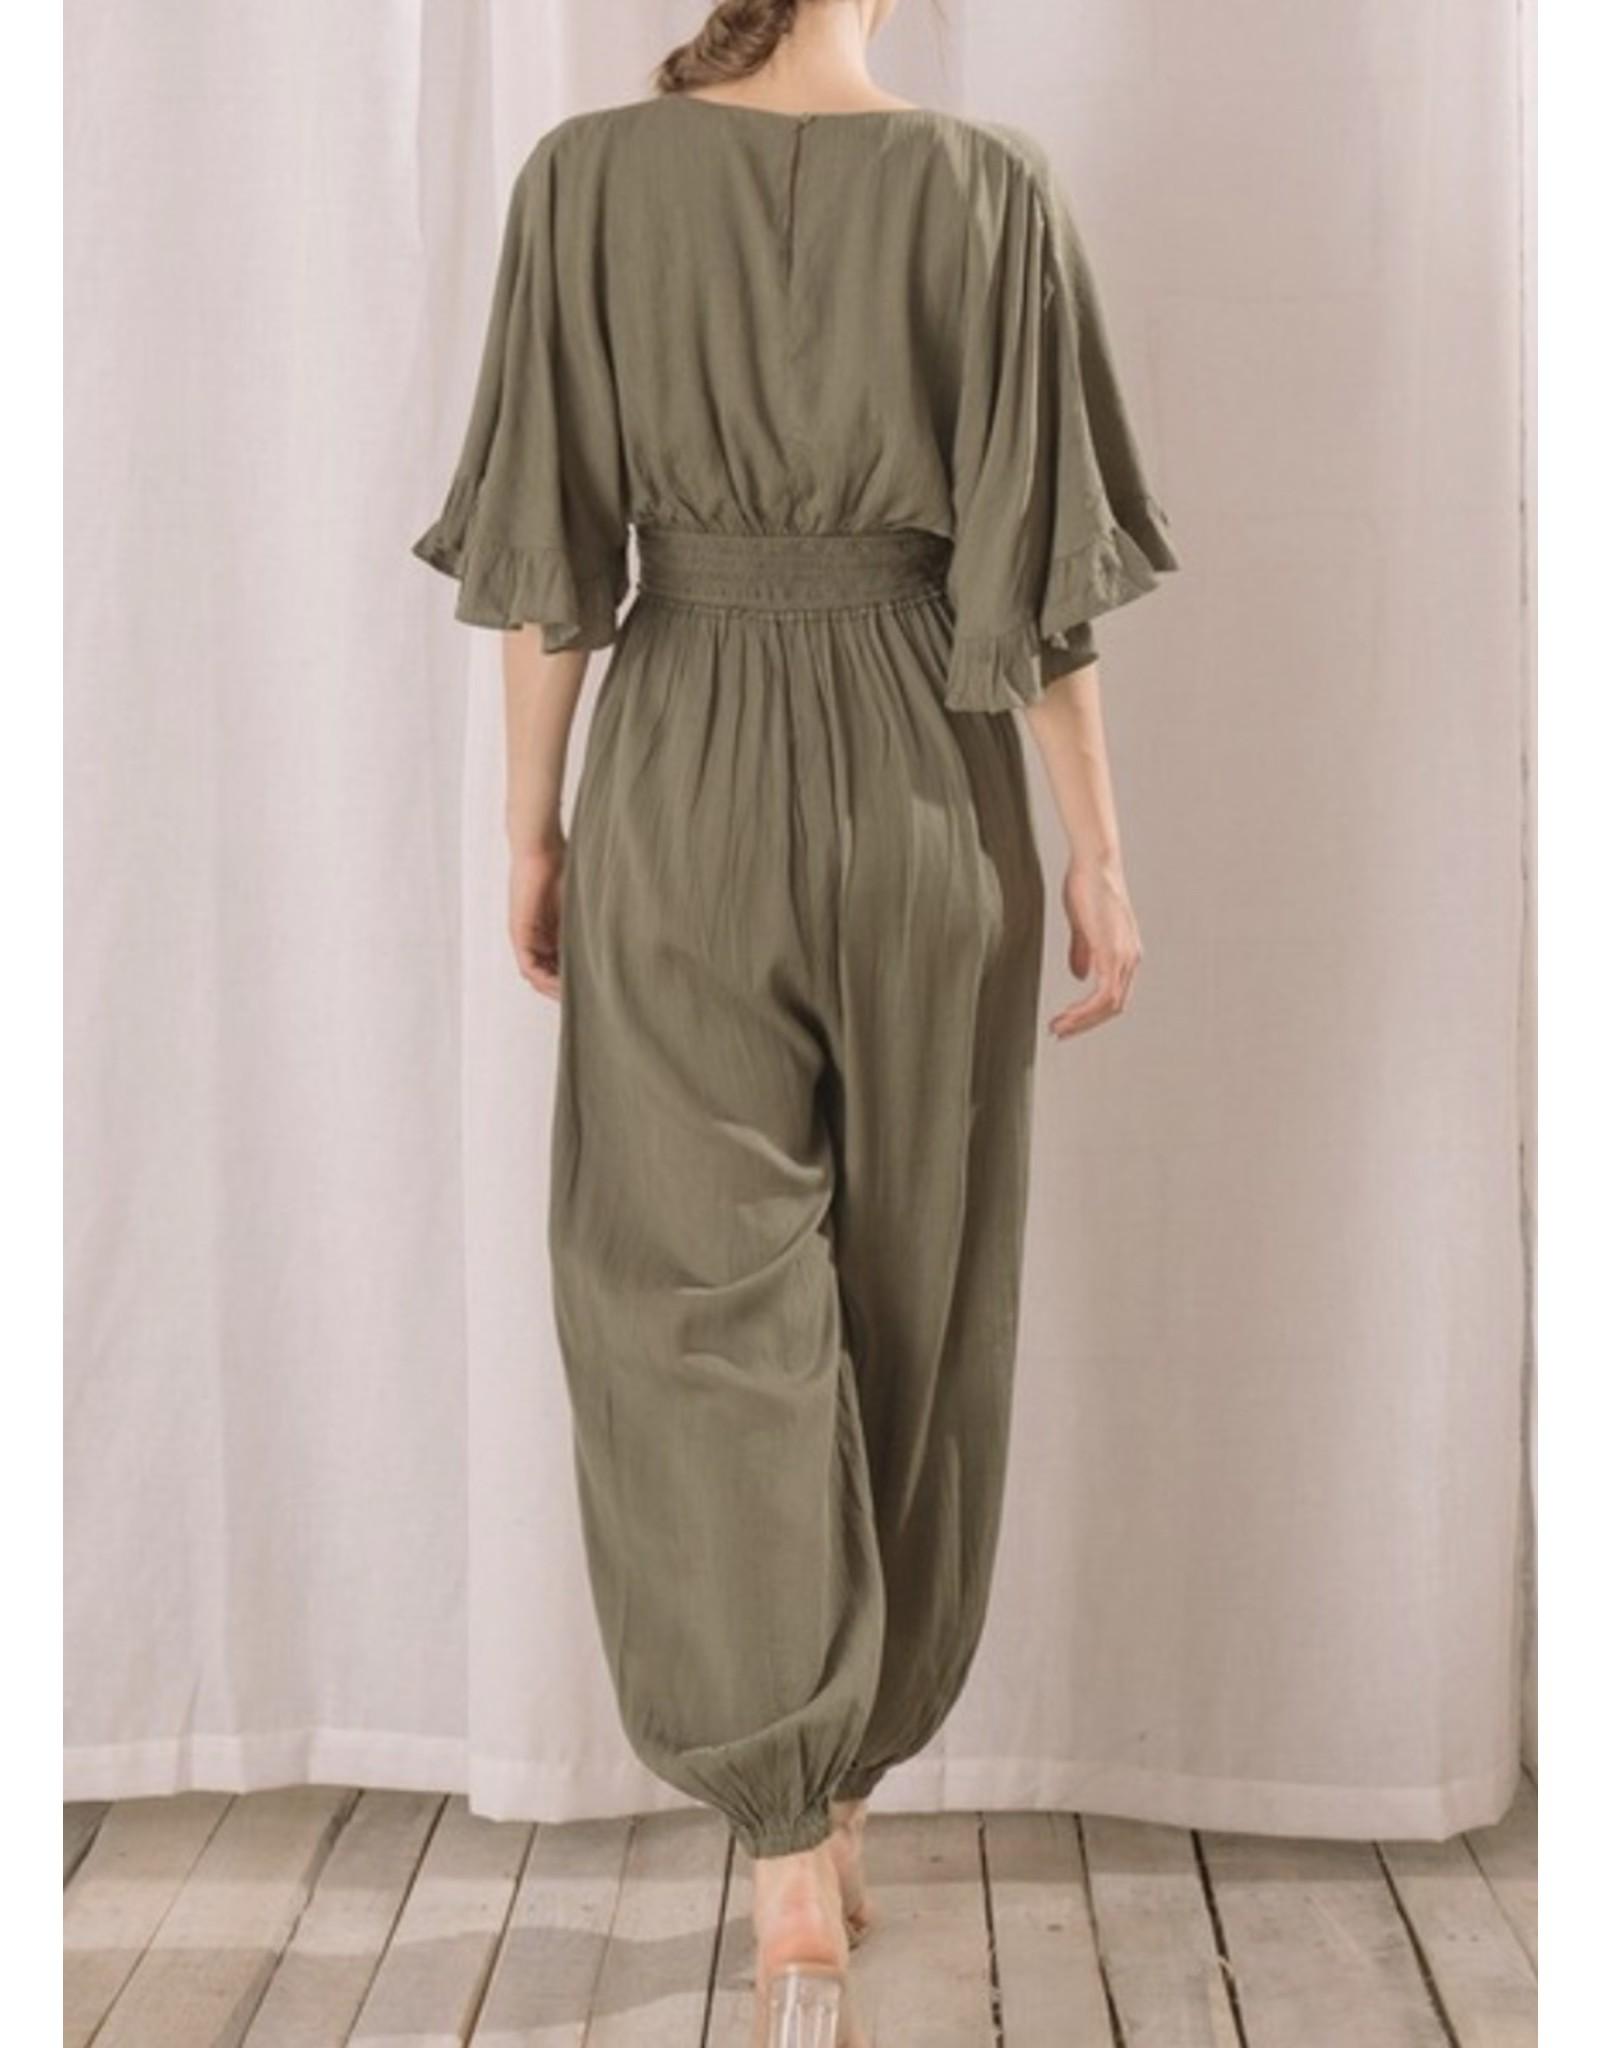 Storia Dolman Sleeves Jumpsuit - Olive